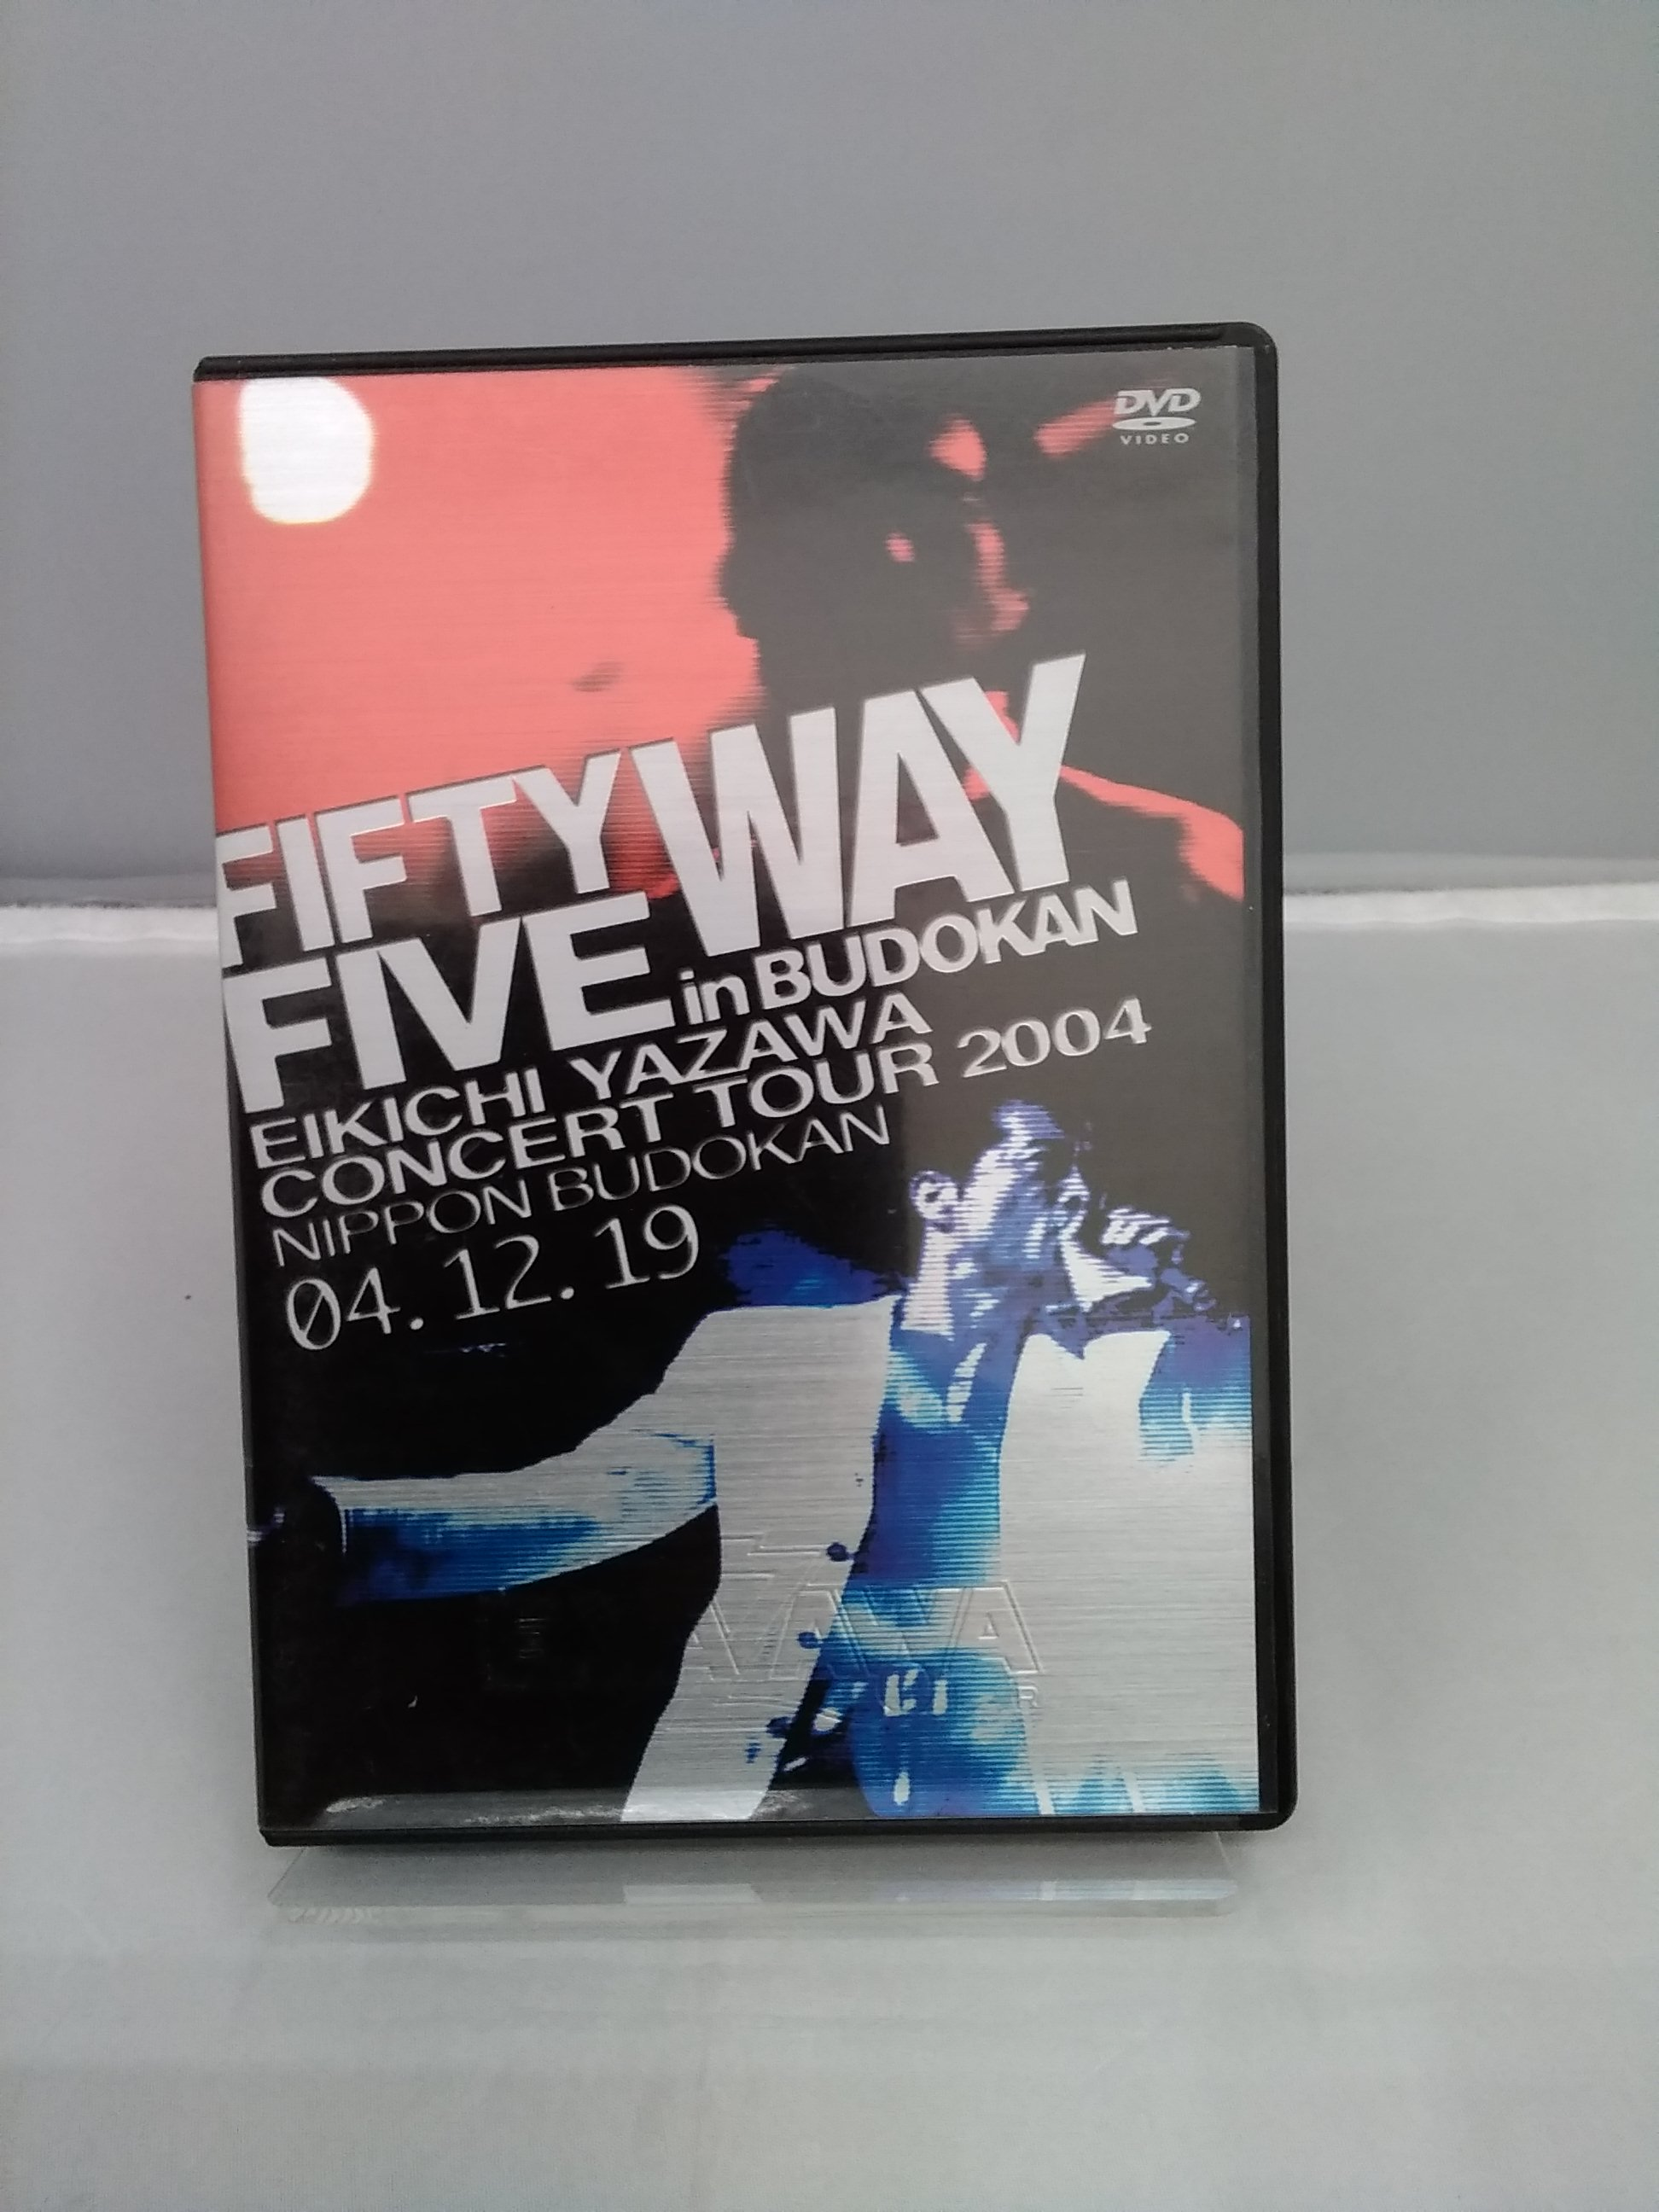 FIFTY FIVE WAY IN BUDOKAN|東芝EMI株式会社